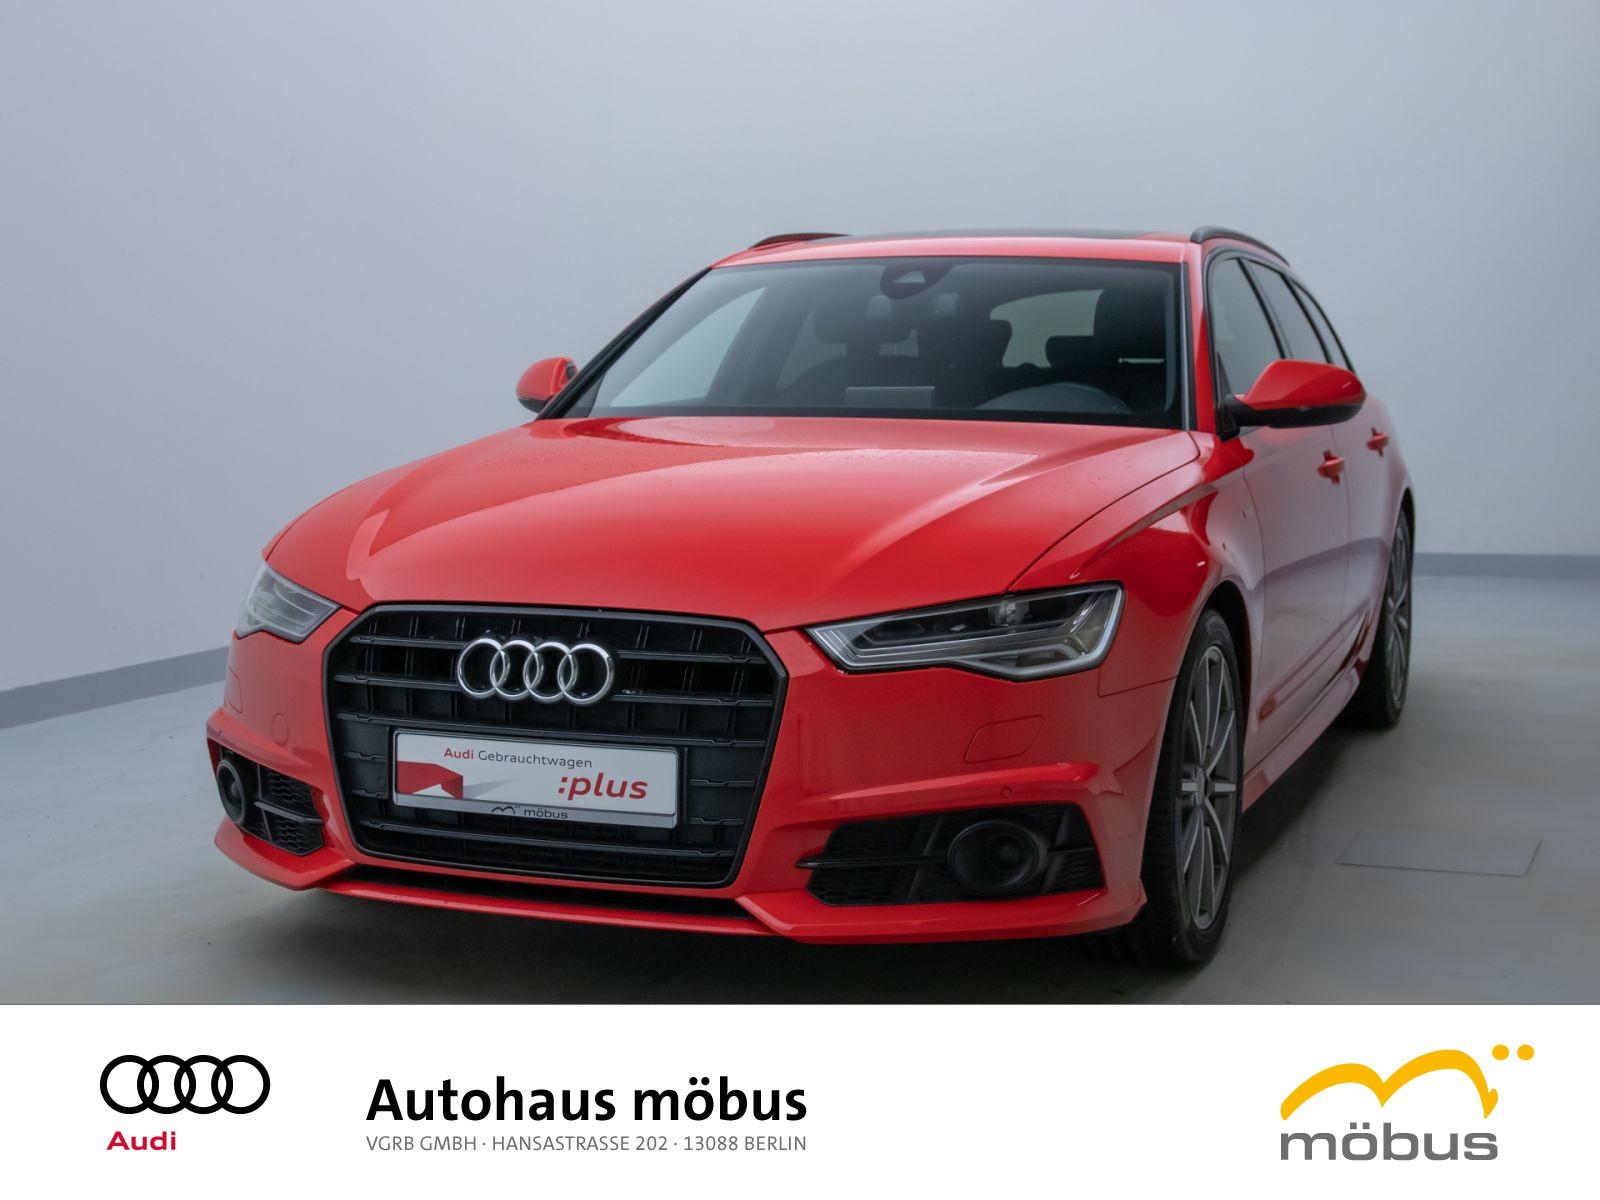 Audi A6 Avant 3.0 TDI S-TRO*SLINE*STDHZ*PANO*RFK*AIR, Jahr 2016, Diesel